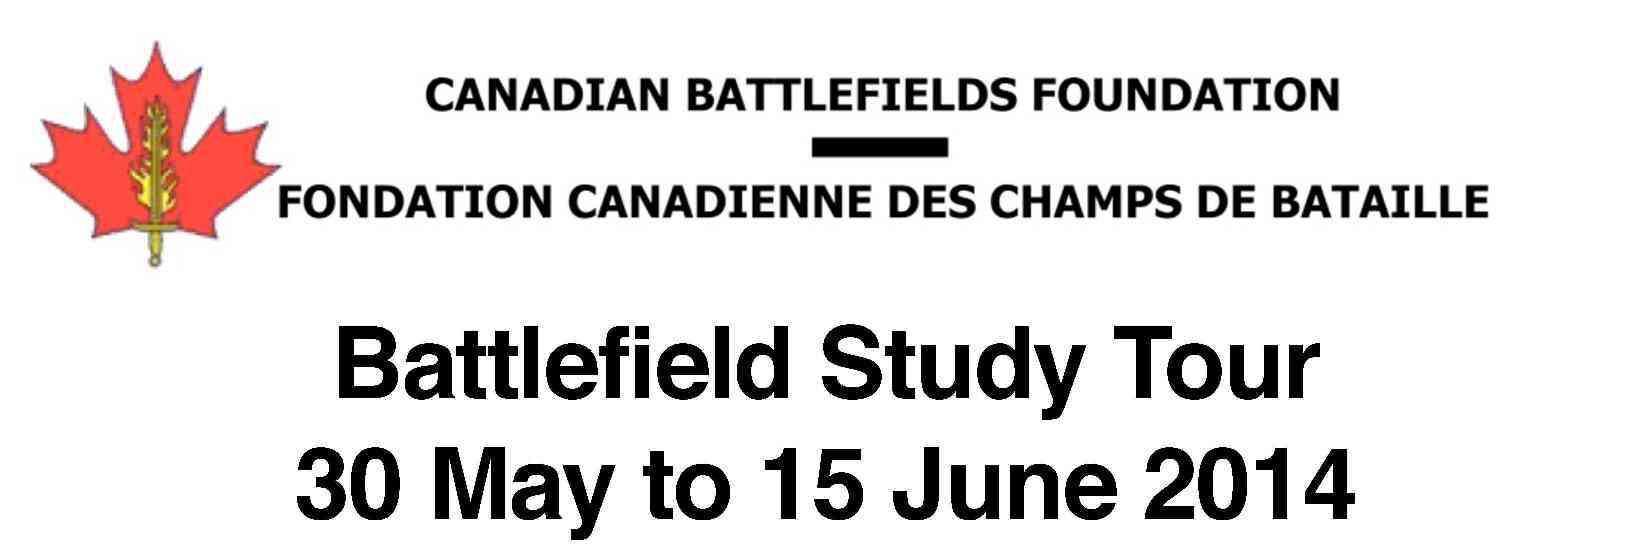 Canadian Battlefields Foundation Battlefield Tour: 30 May – 15 June 2014